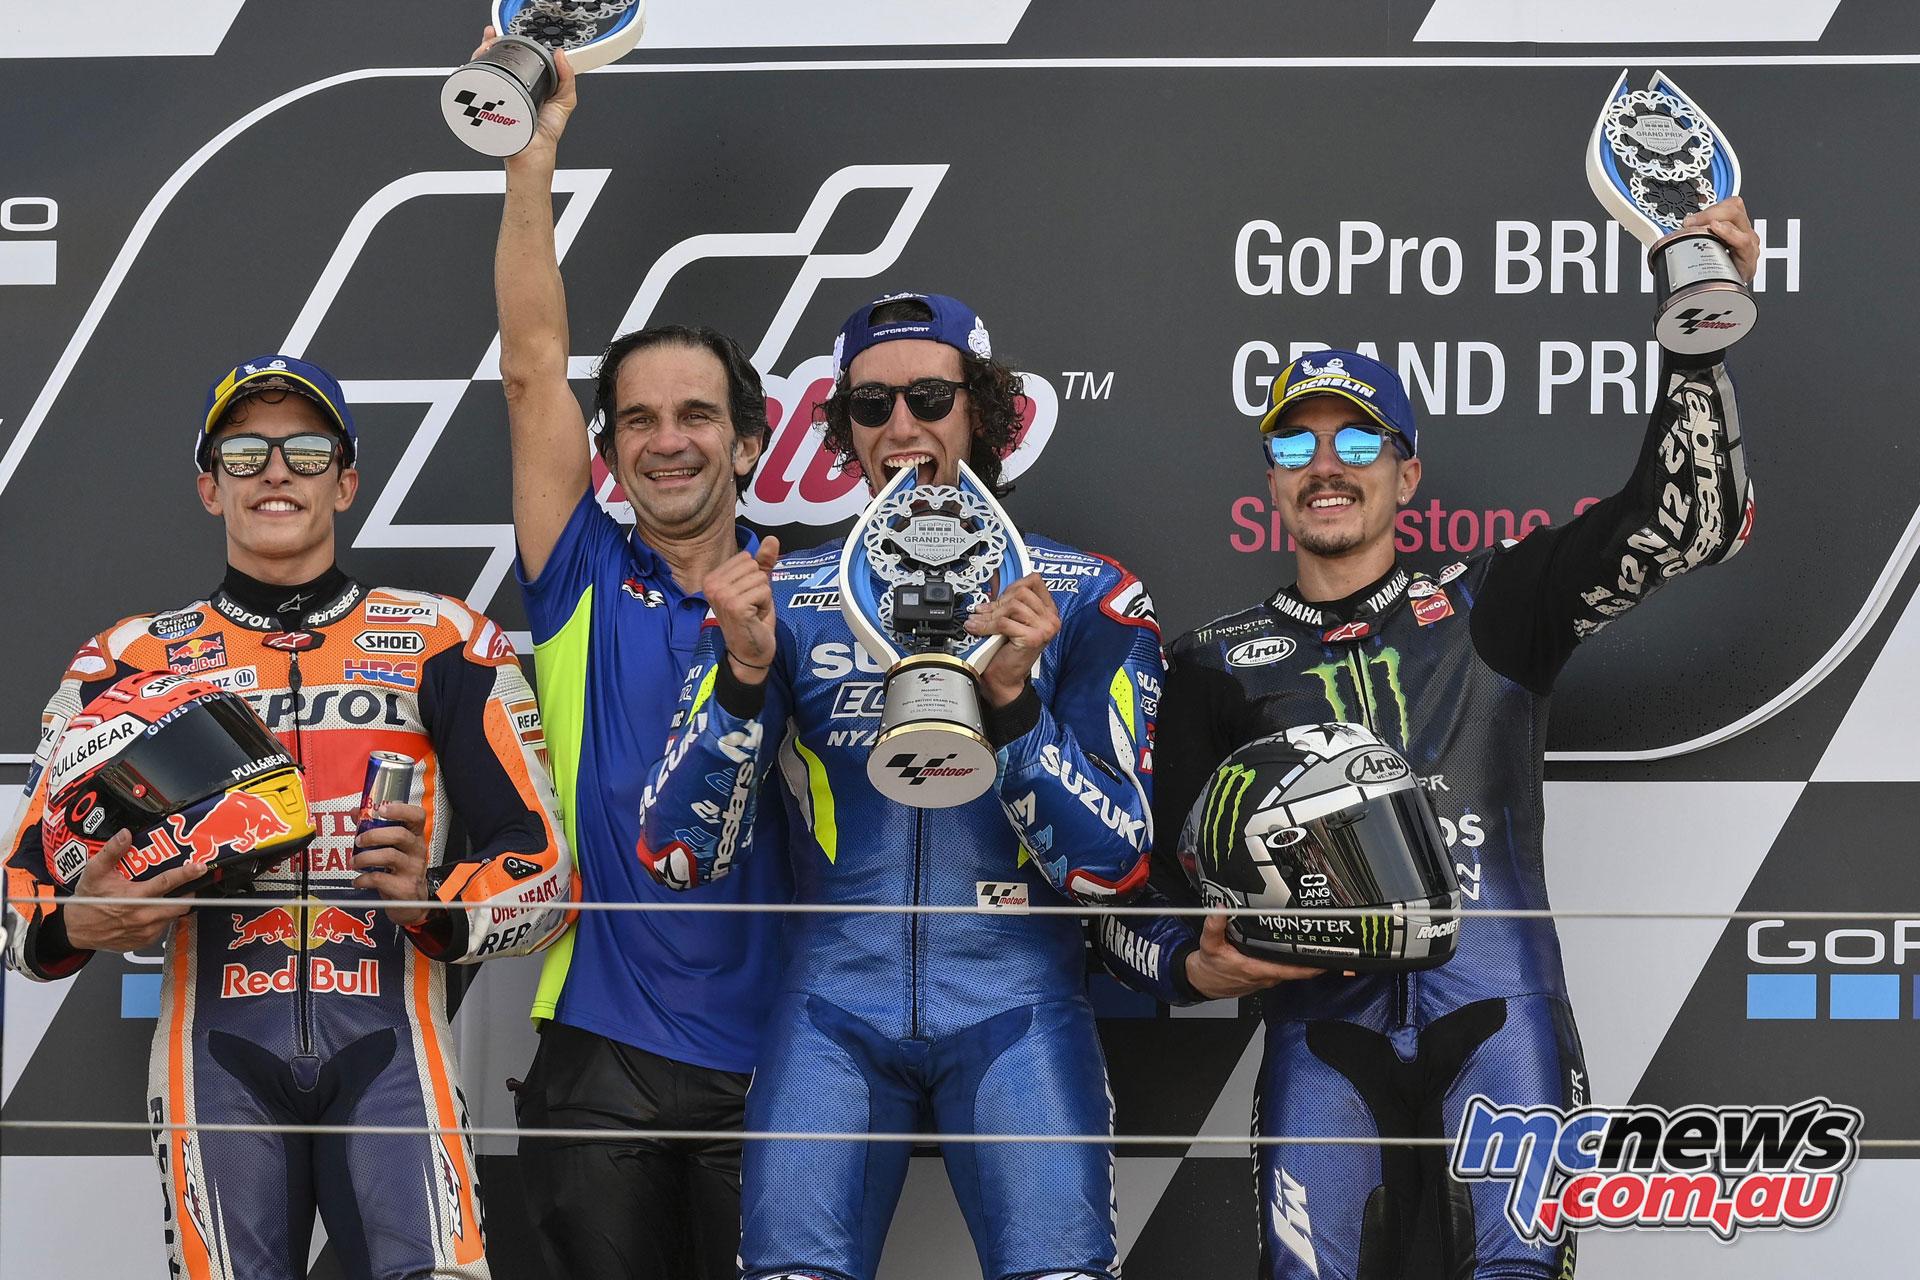 MotoGP Rnd Silverstone alex rins podium